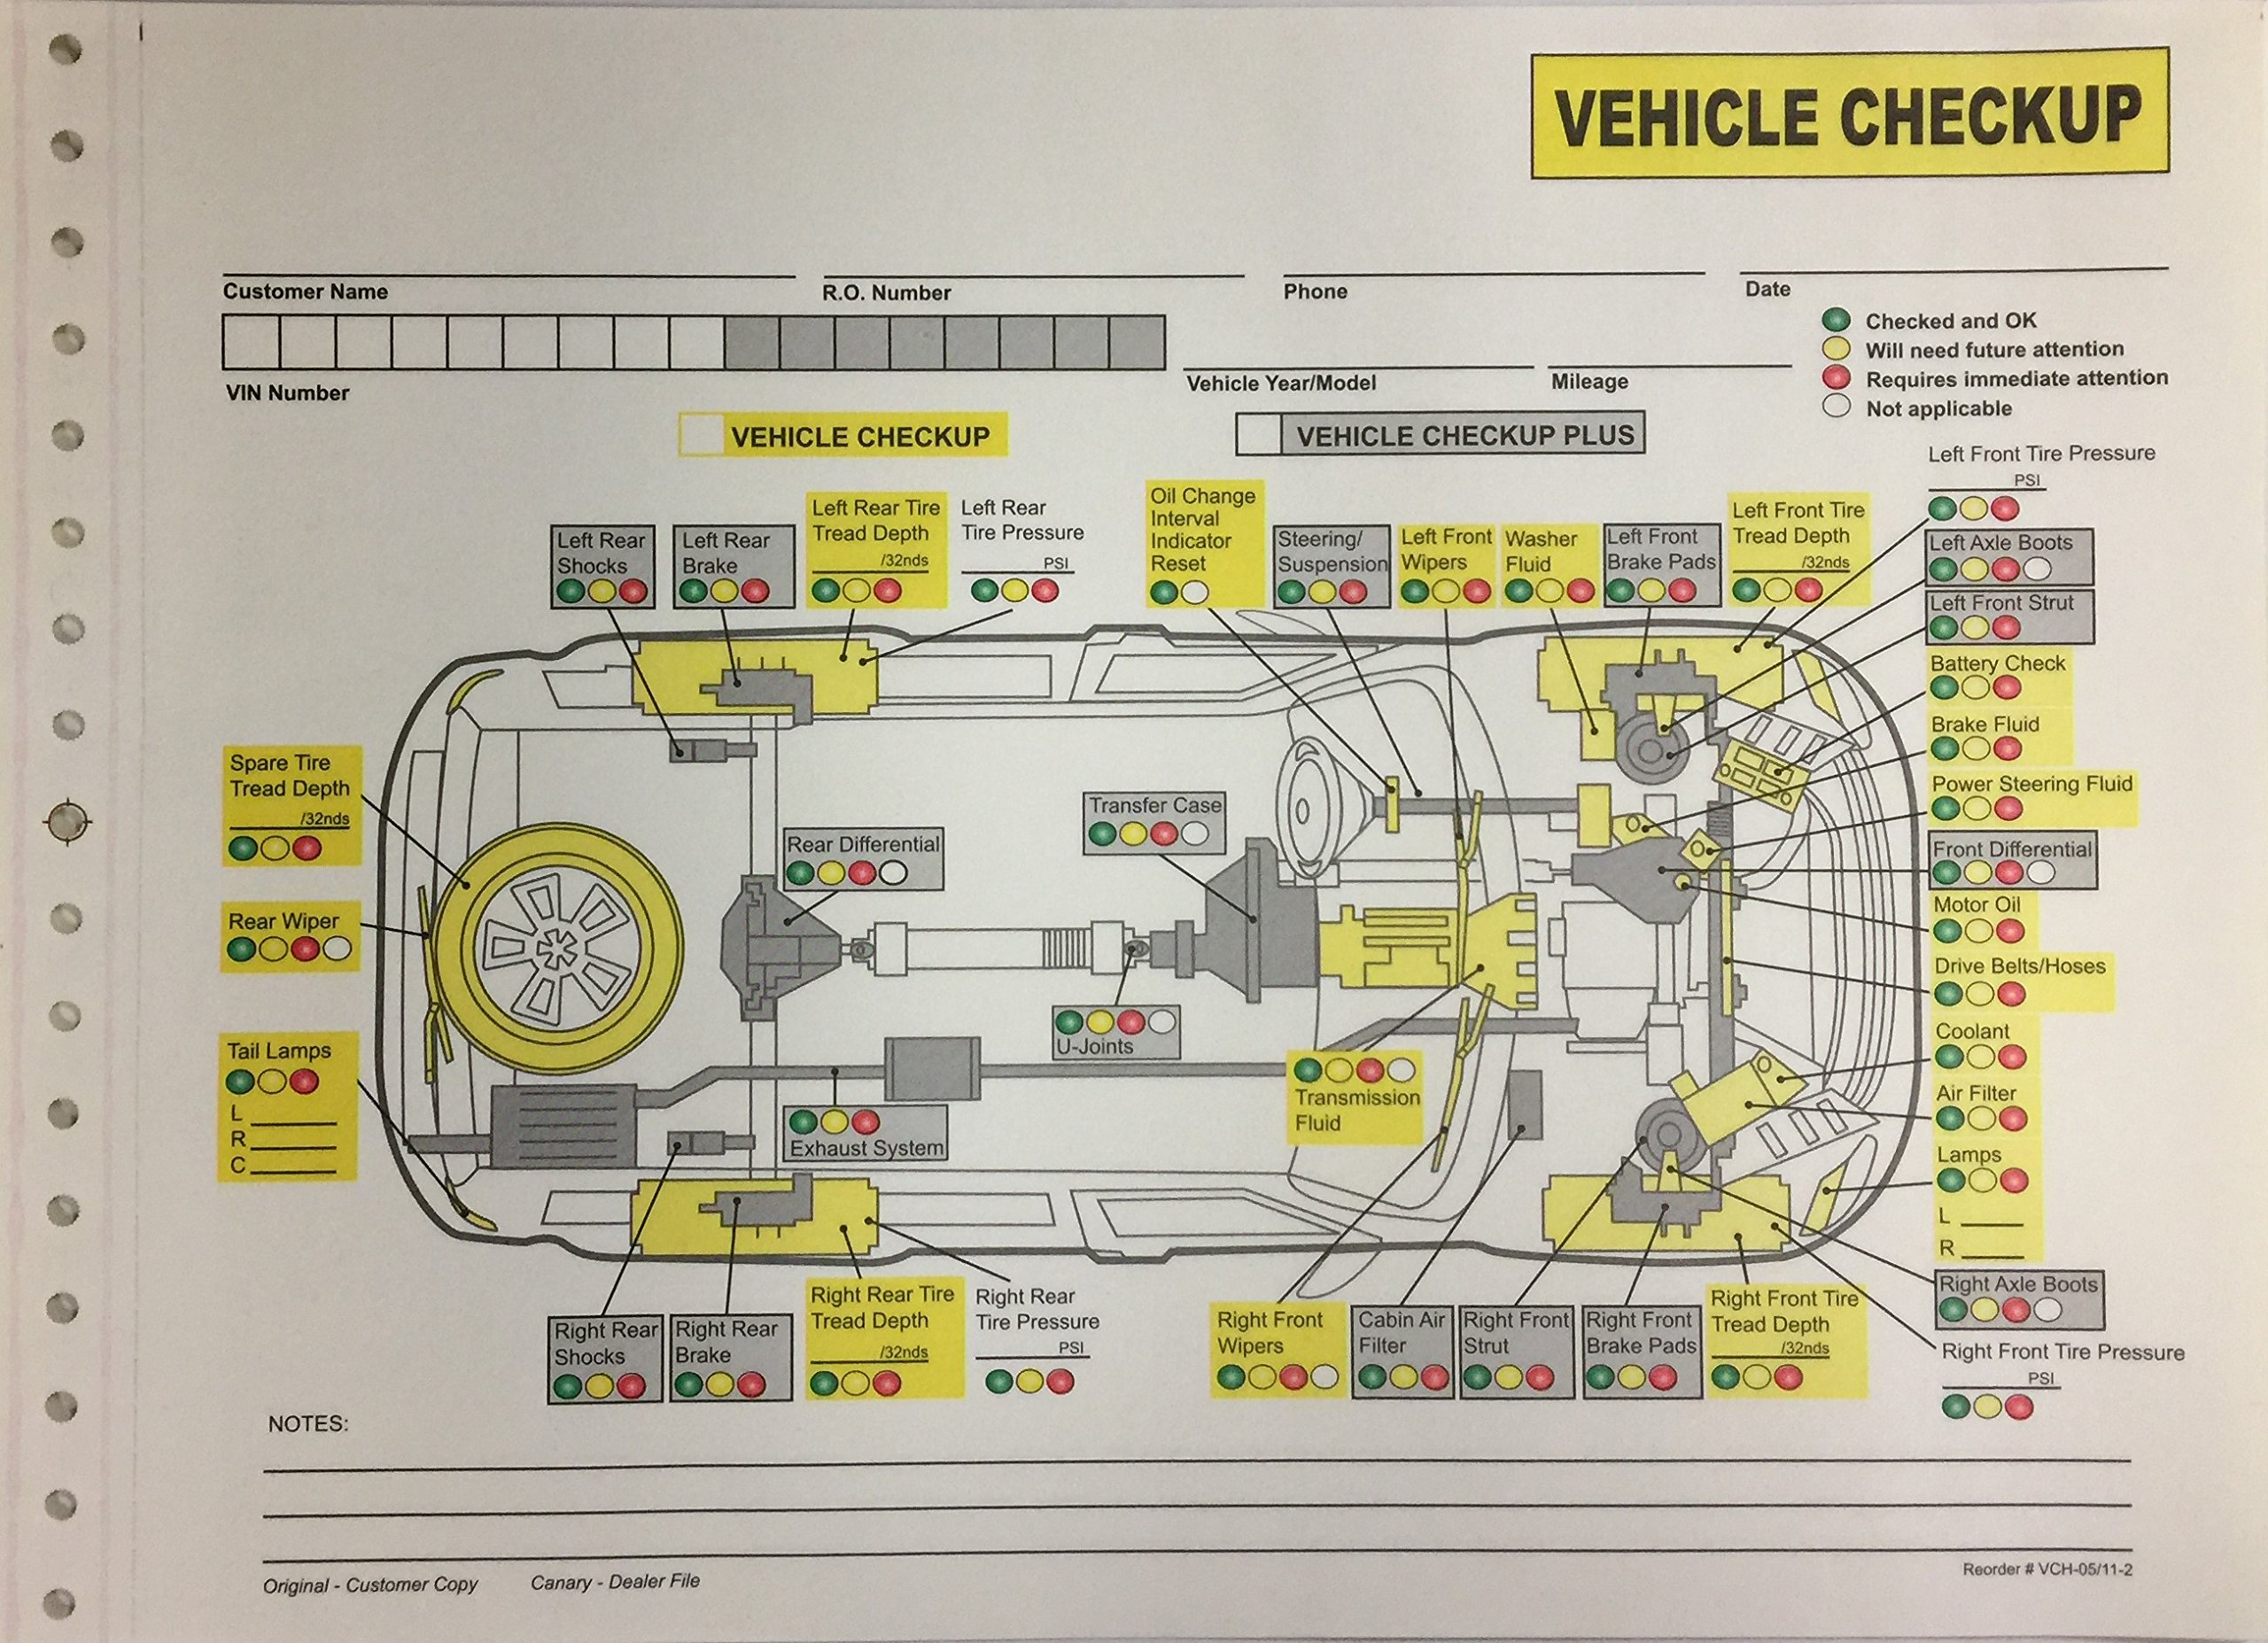 Auto Repair Vehicle Checkup Inspection Form - 2 Part NCR - Quantity 400 (P10R)